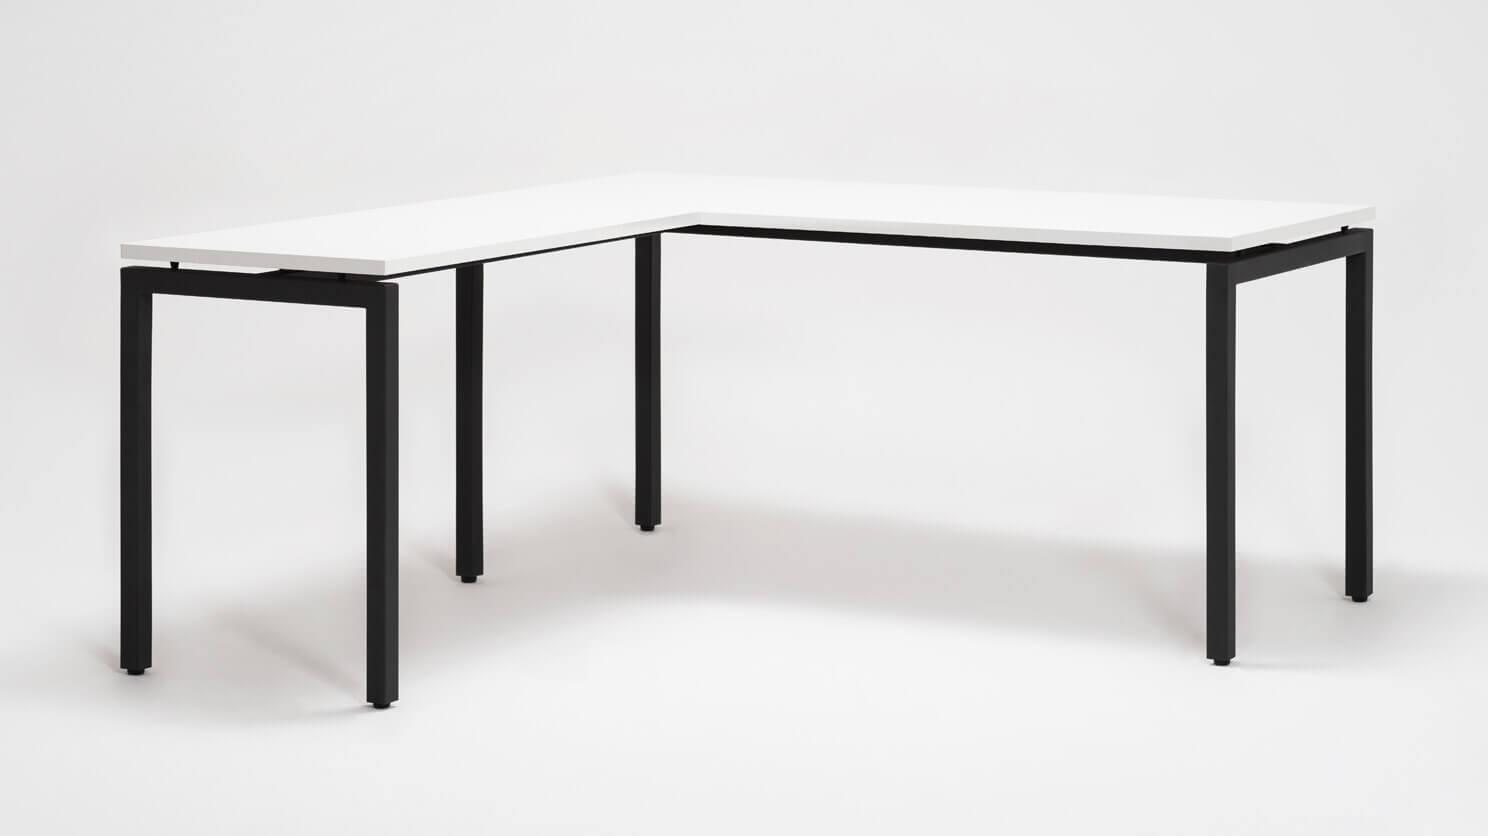 The Novah L Desk From Eq3 Studio Desk Canada